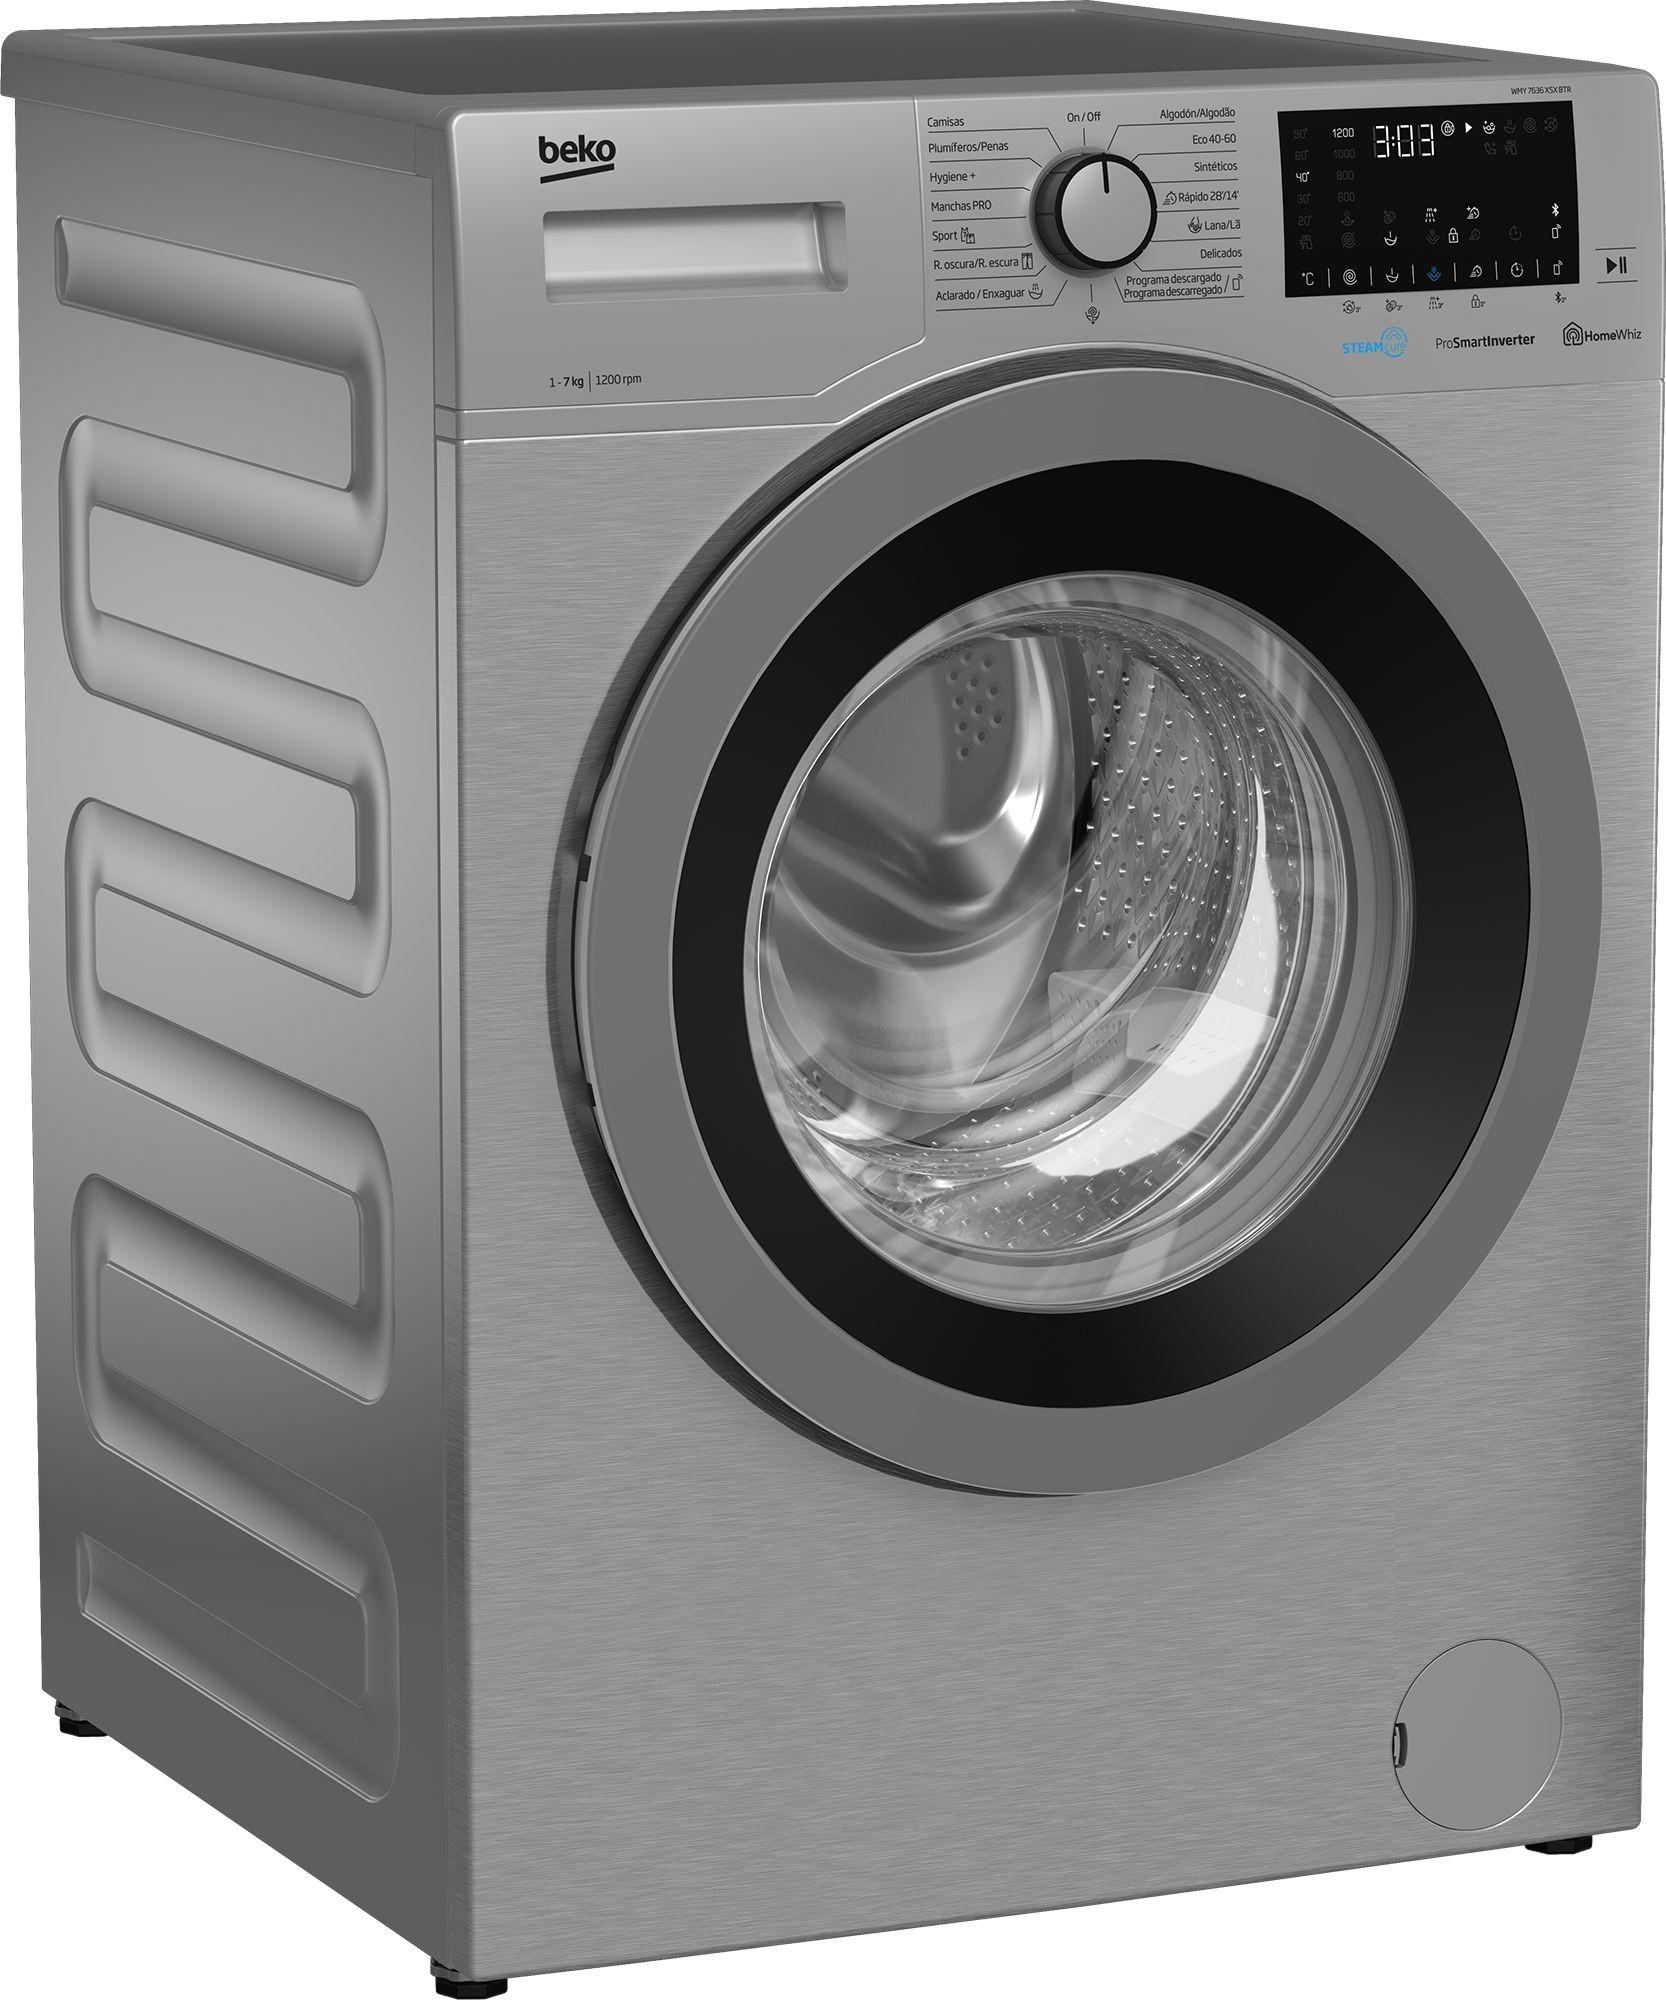 lavadora beko wmy 7636 xsx btr inox 7kg bluetooth